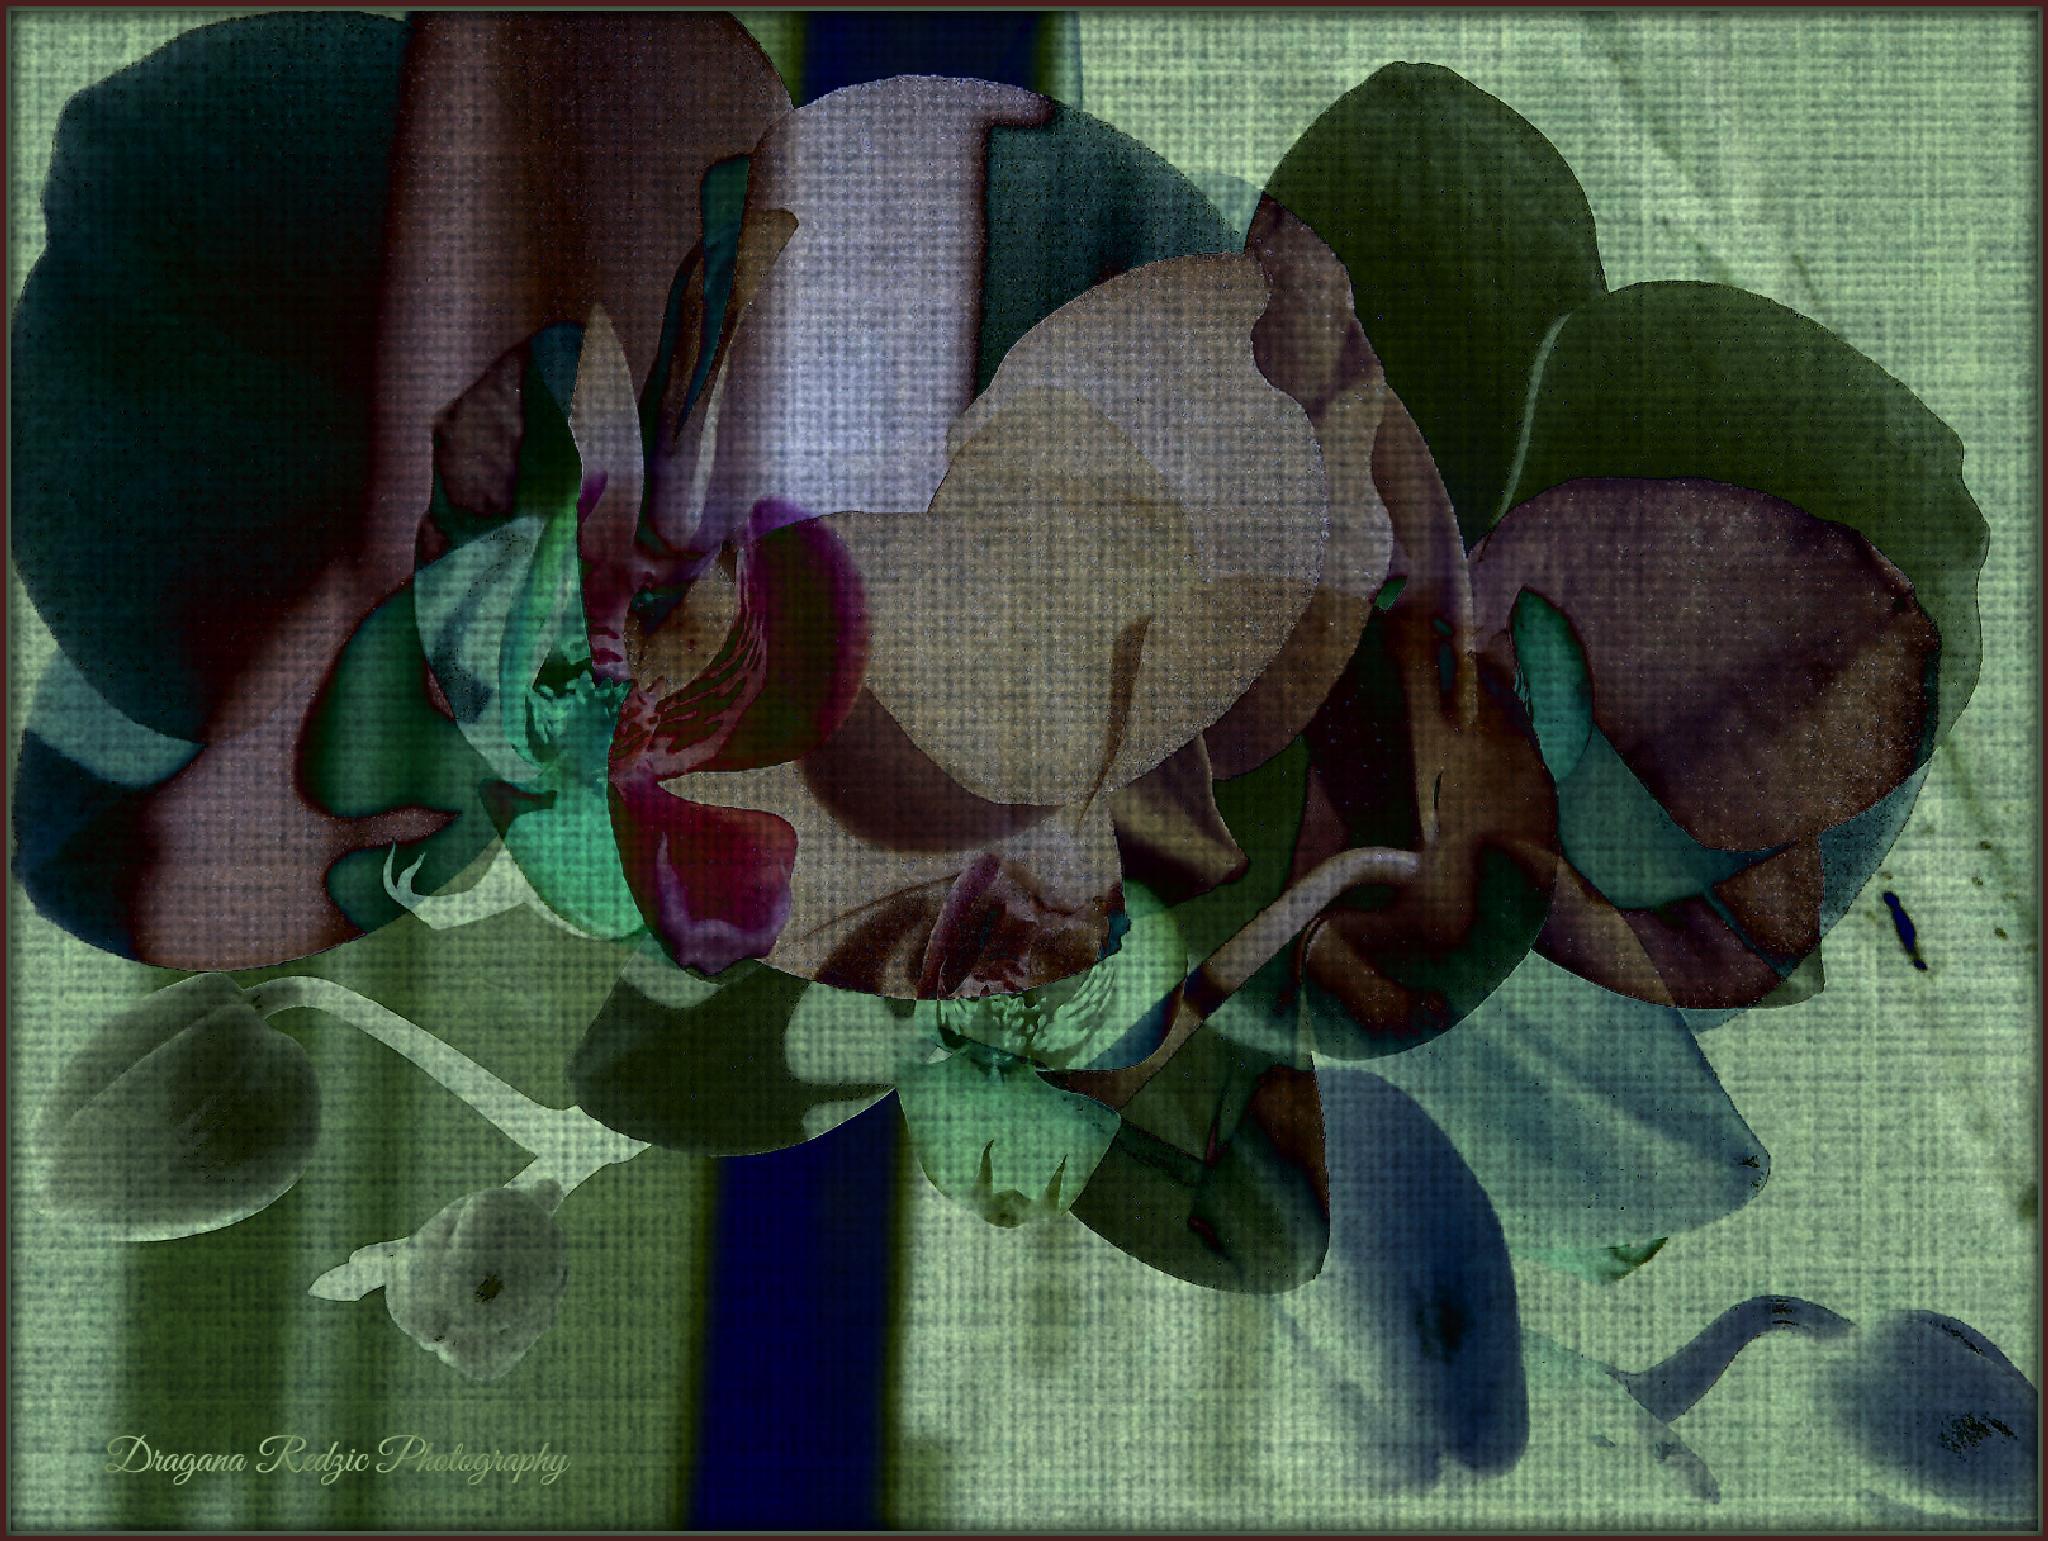 Orchids ~ Art photo by Драгана М. Реџић